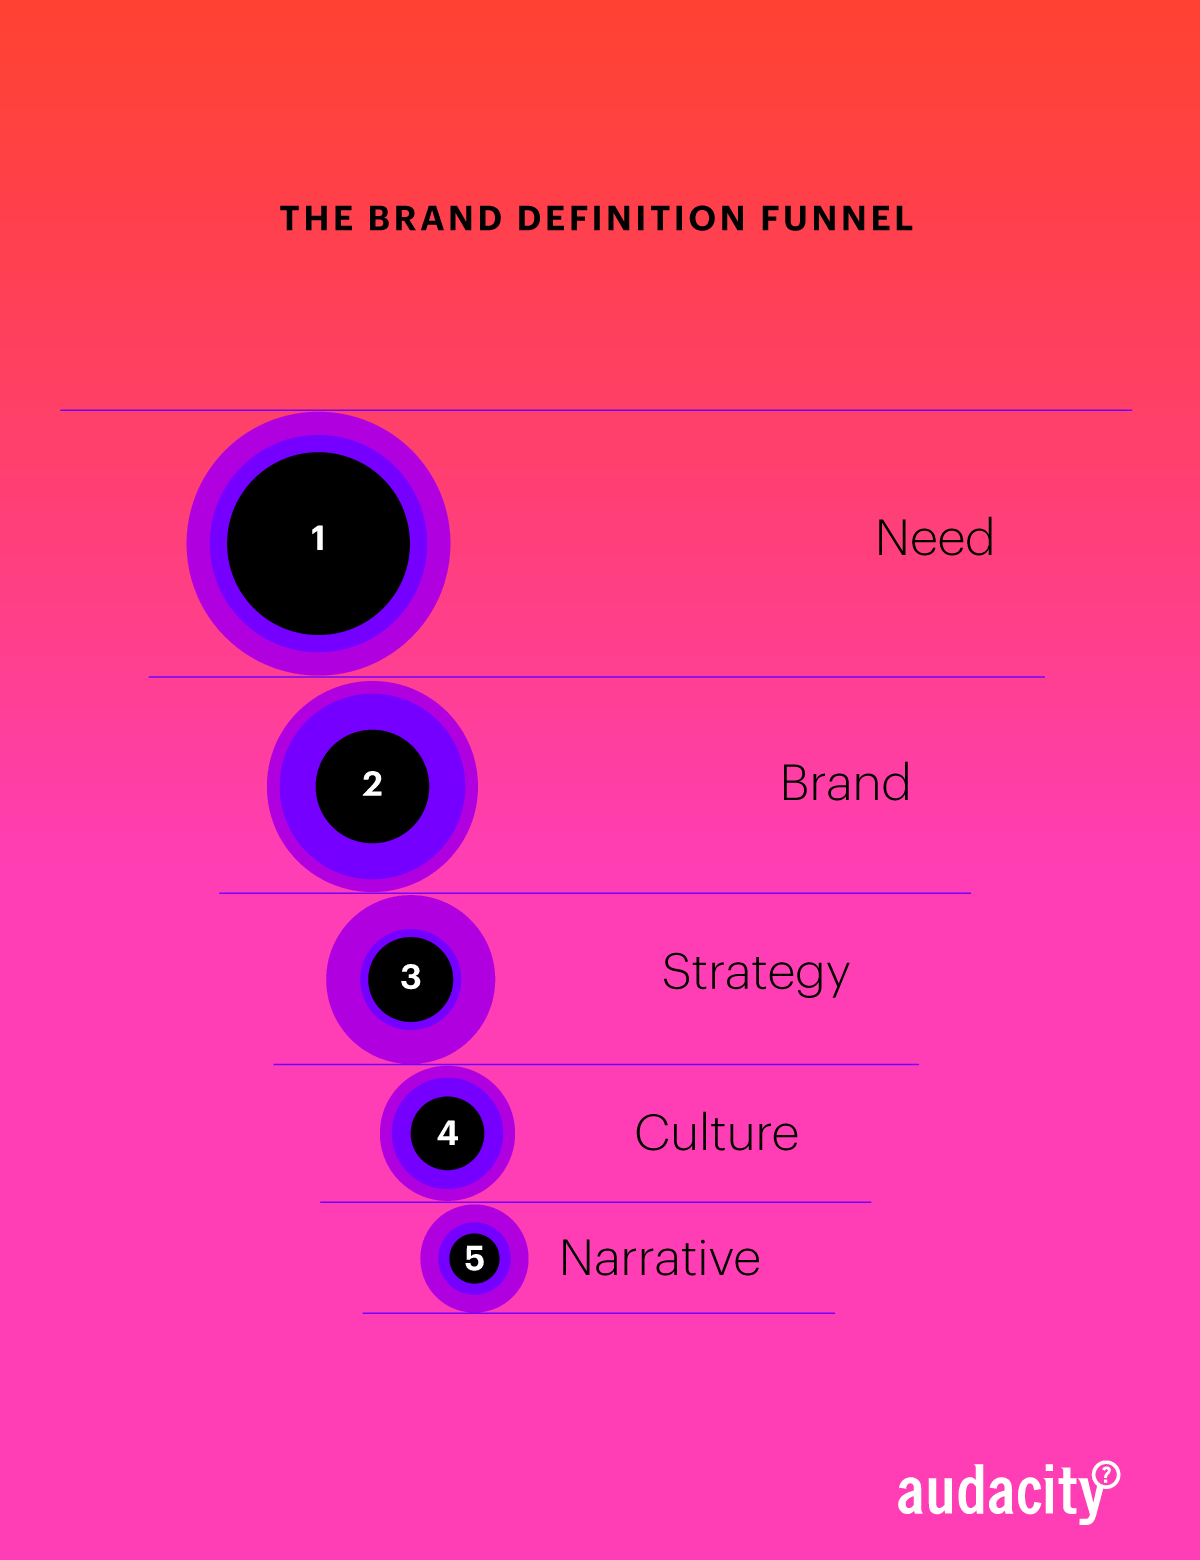 Brand Definition Funnel diagram